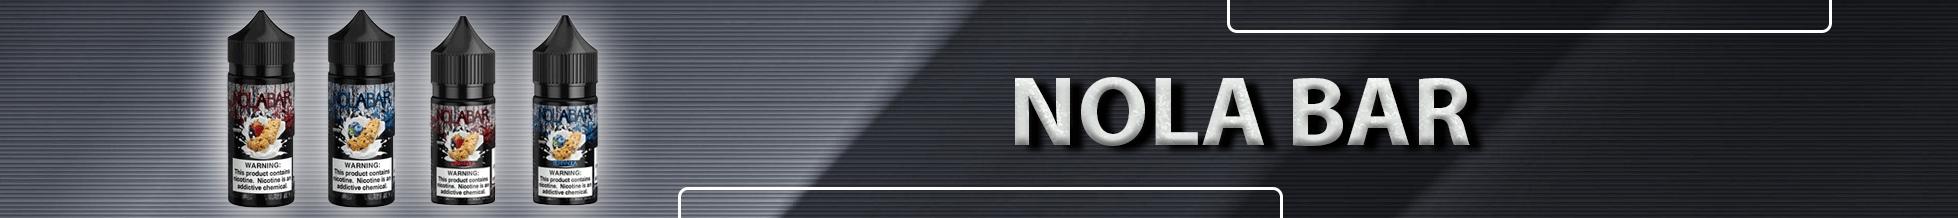 nola-bar-category-banner.png